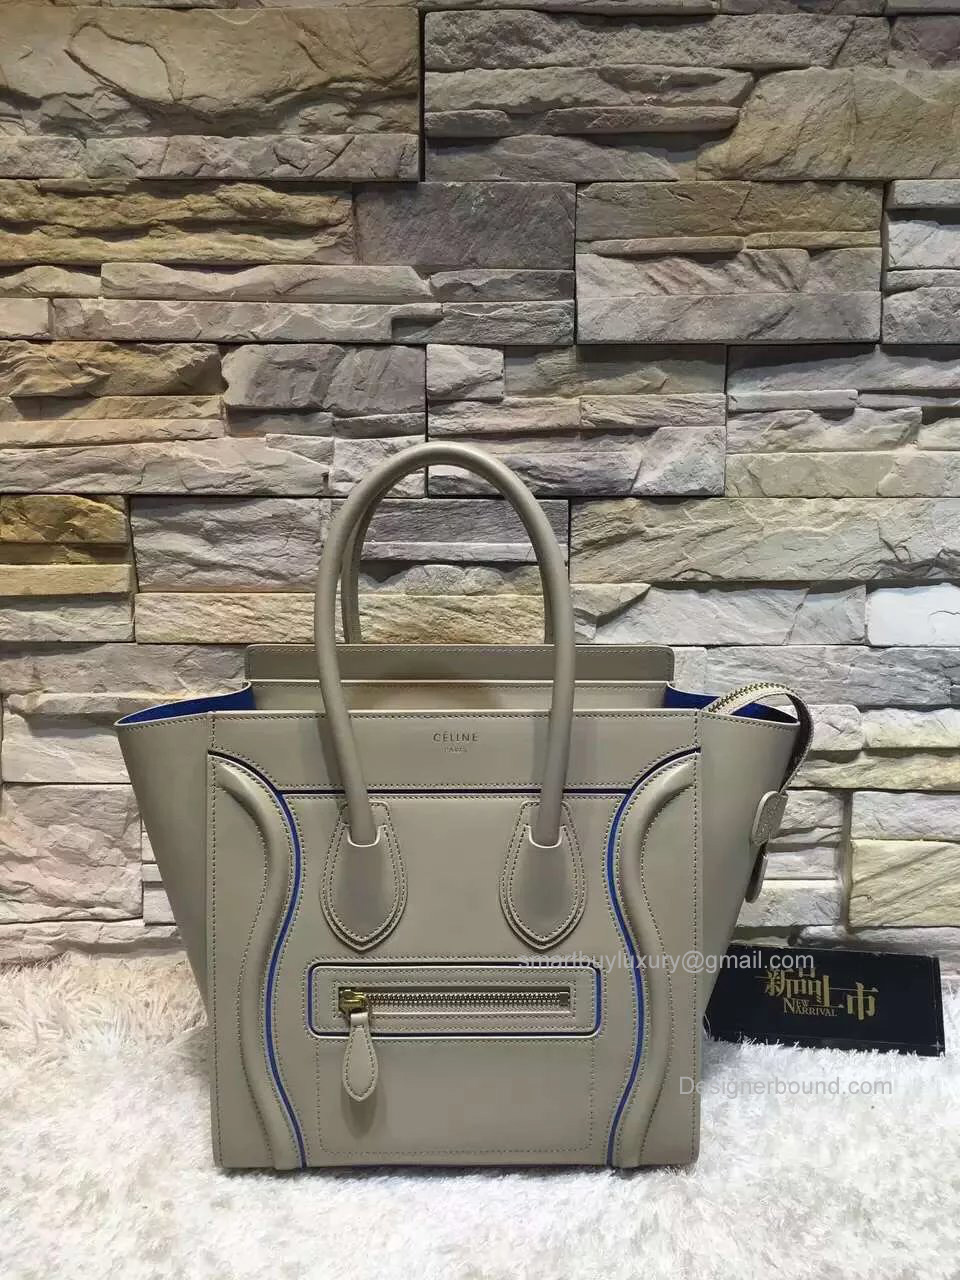 celine tote bag for sale - Replica Celine Micro Luggage Handbag with Interstice in Light Grey ...